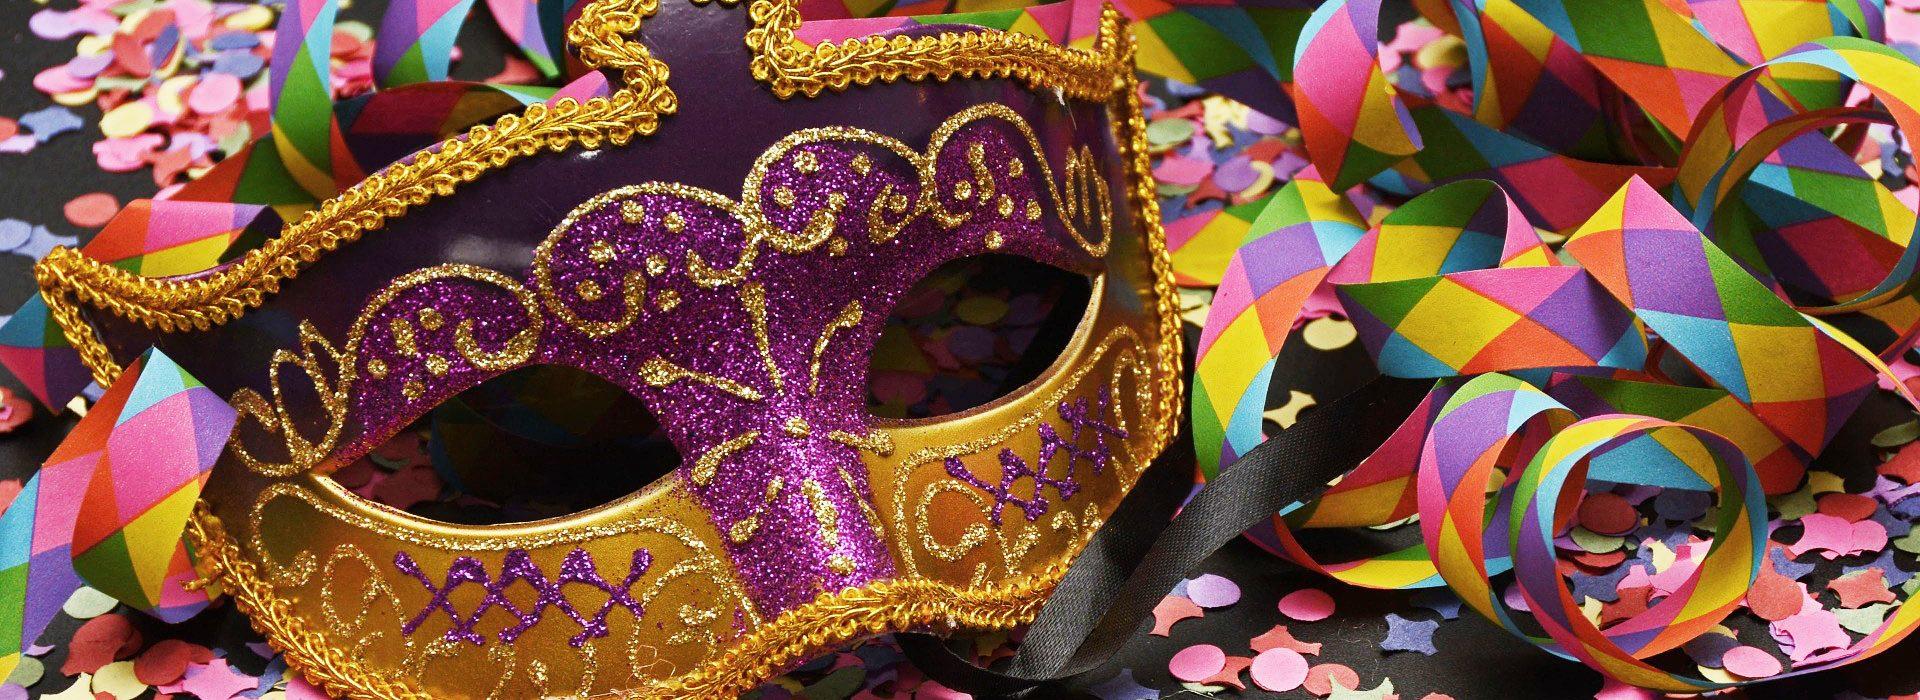 carnaval-em-brotas-miragua-refugios